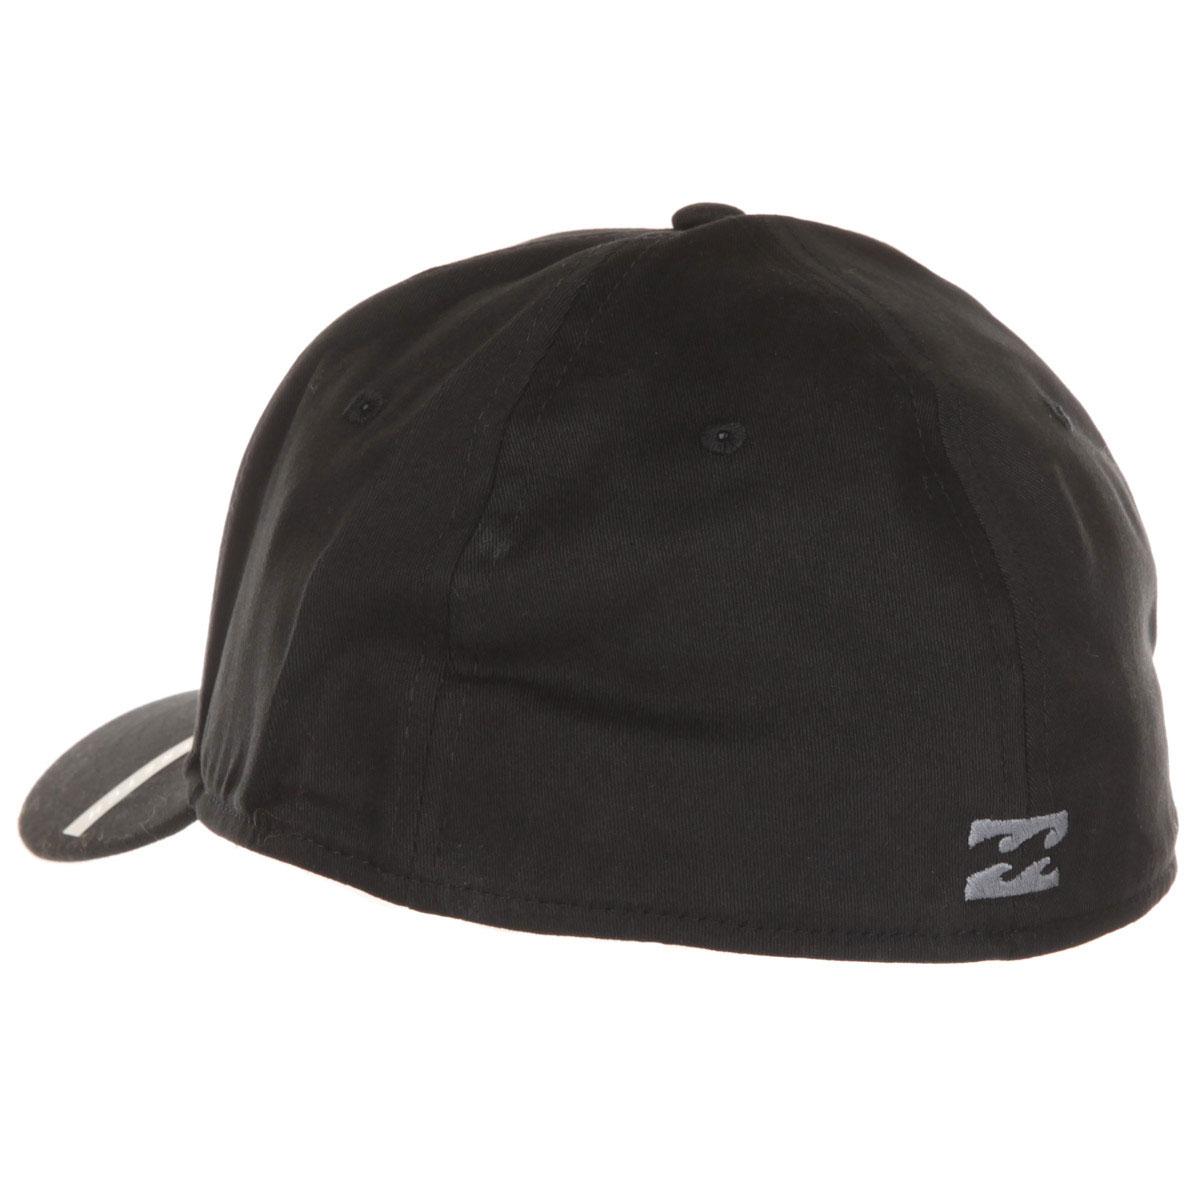 Billabong The Walled Stretch classic baseball cap All Black L5CF01-BIF8-2204